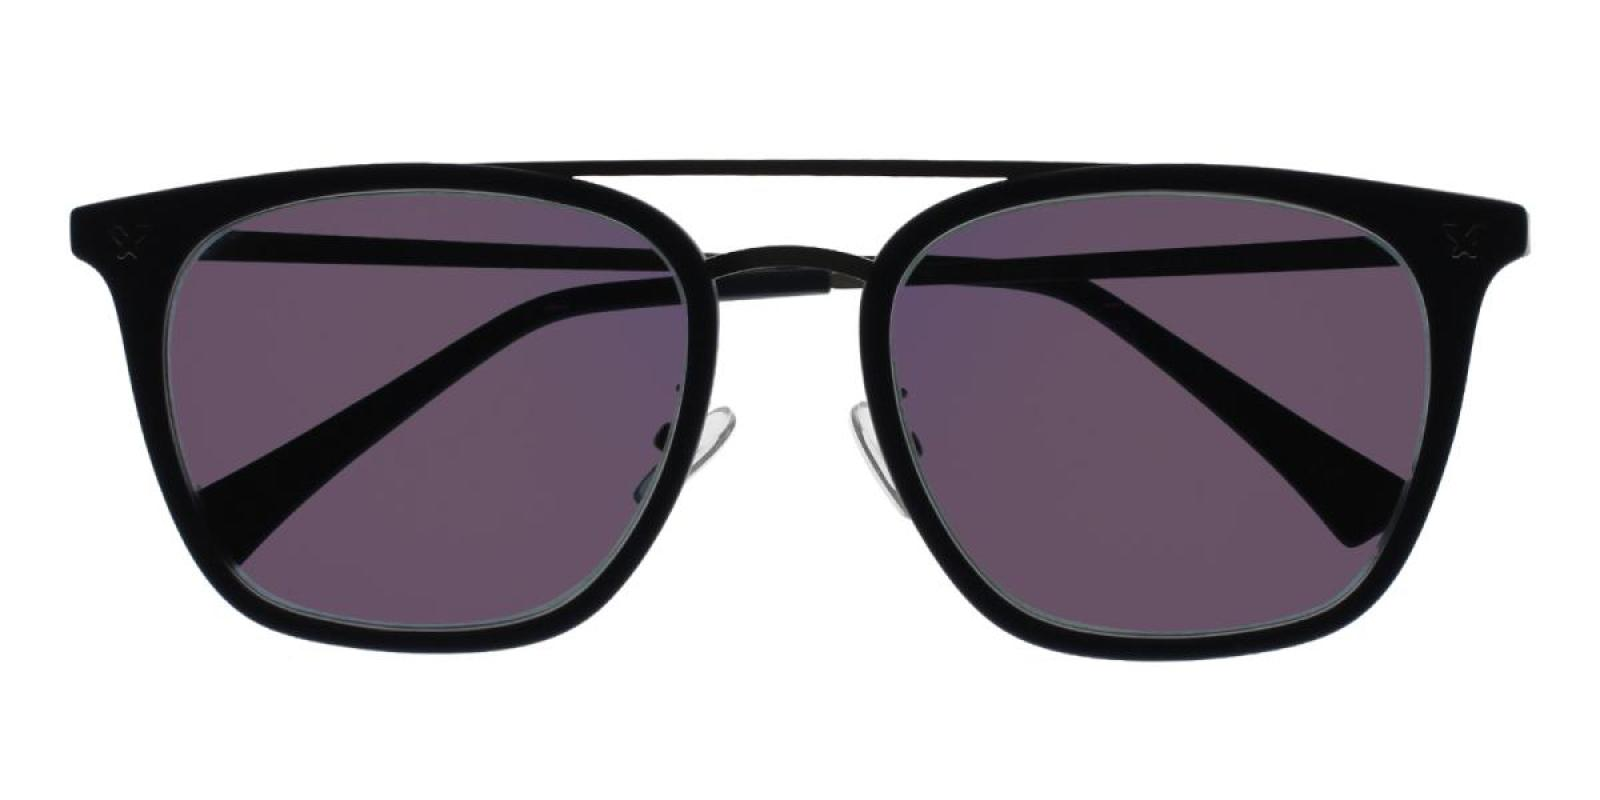 Seagual-Blue-Aviator-Metal / Combination / TR-Sunglasses-detail